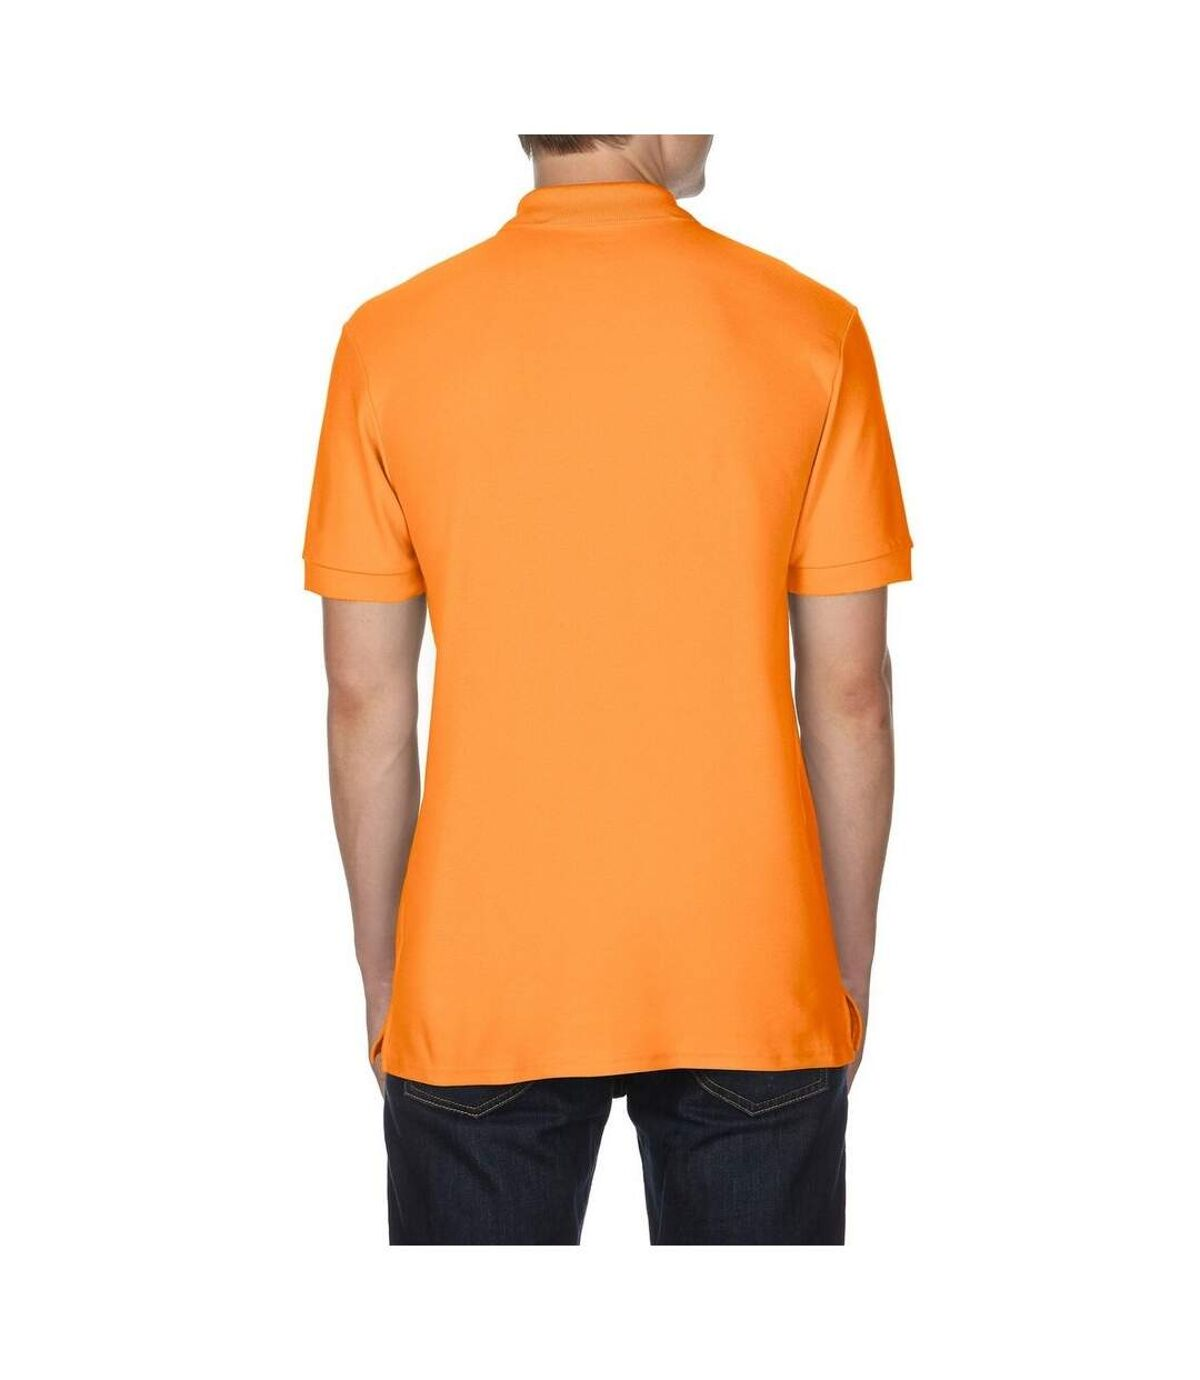 Gildan Mens Premium Cotton Sport Double Pique Polo Shirt (Tangerine) - UTBC3194